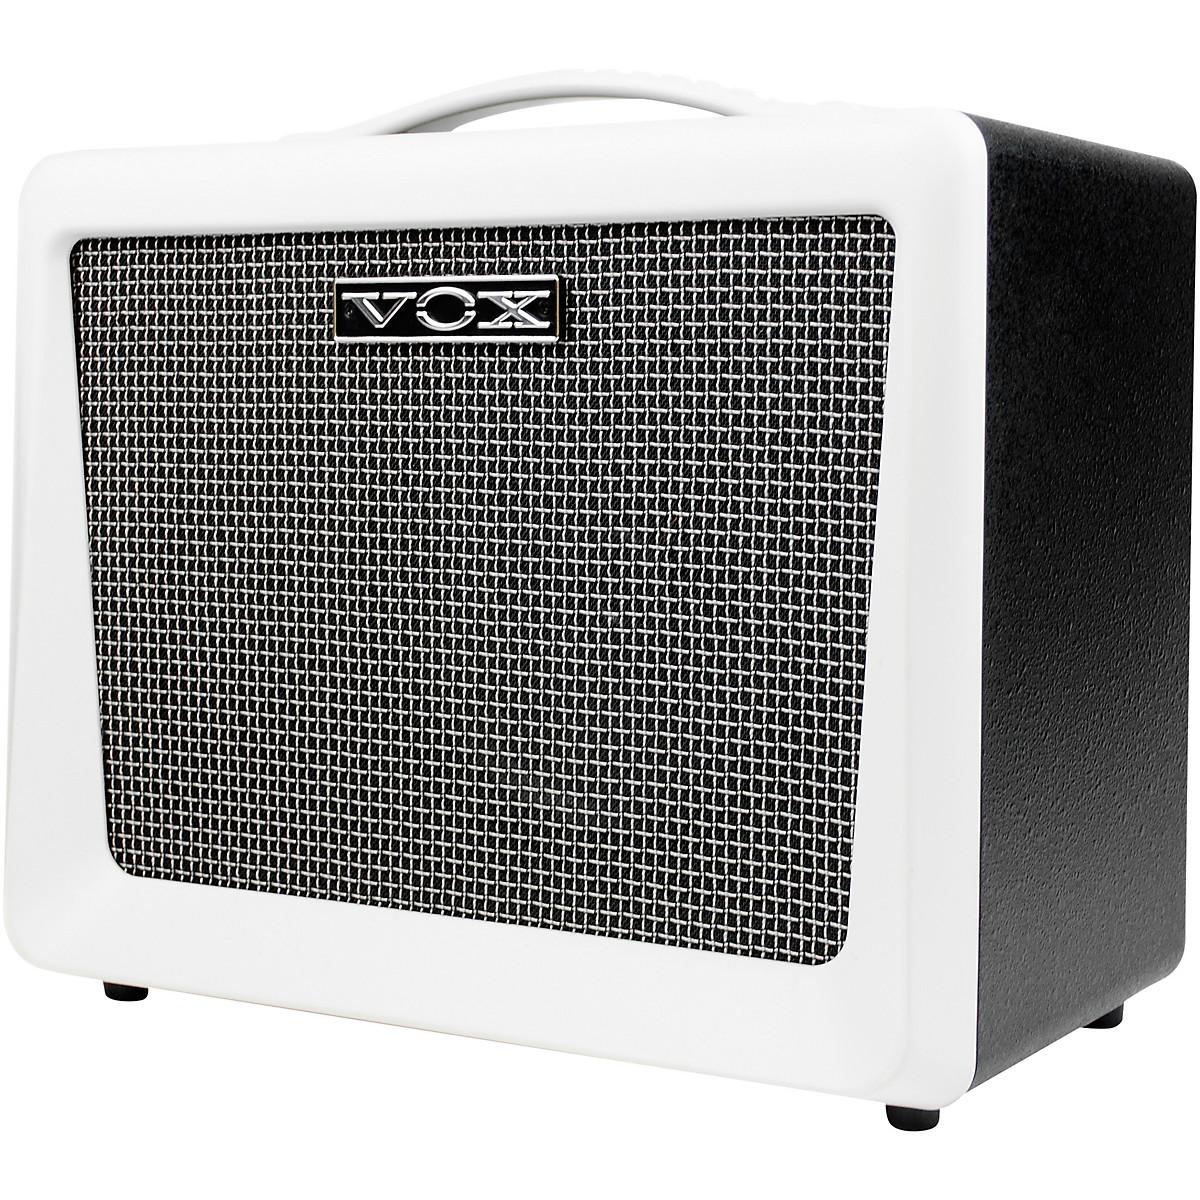 Vox 50 Watt Keyboard amp W/Nutube